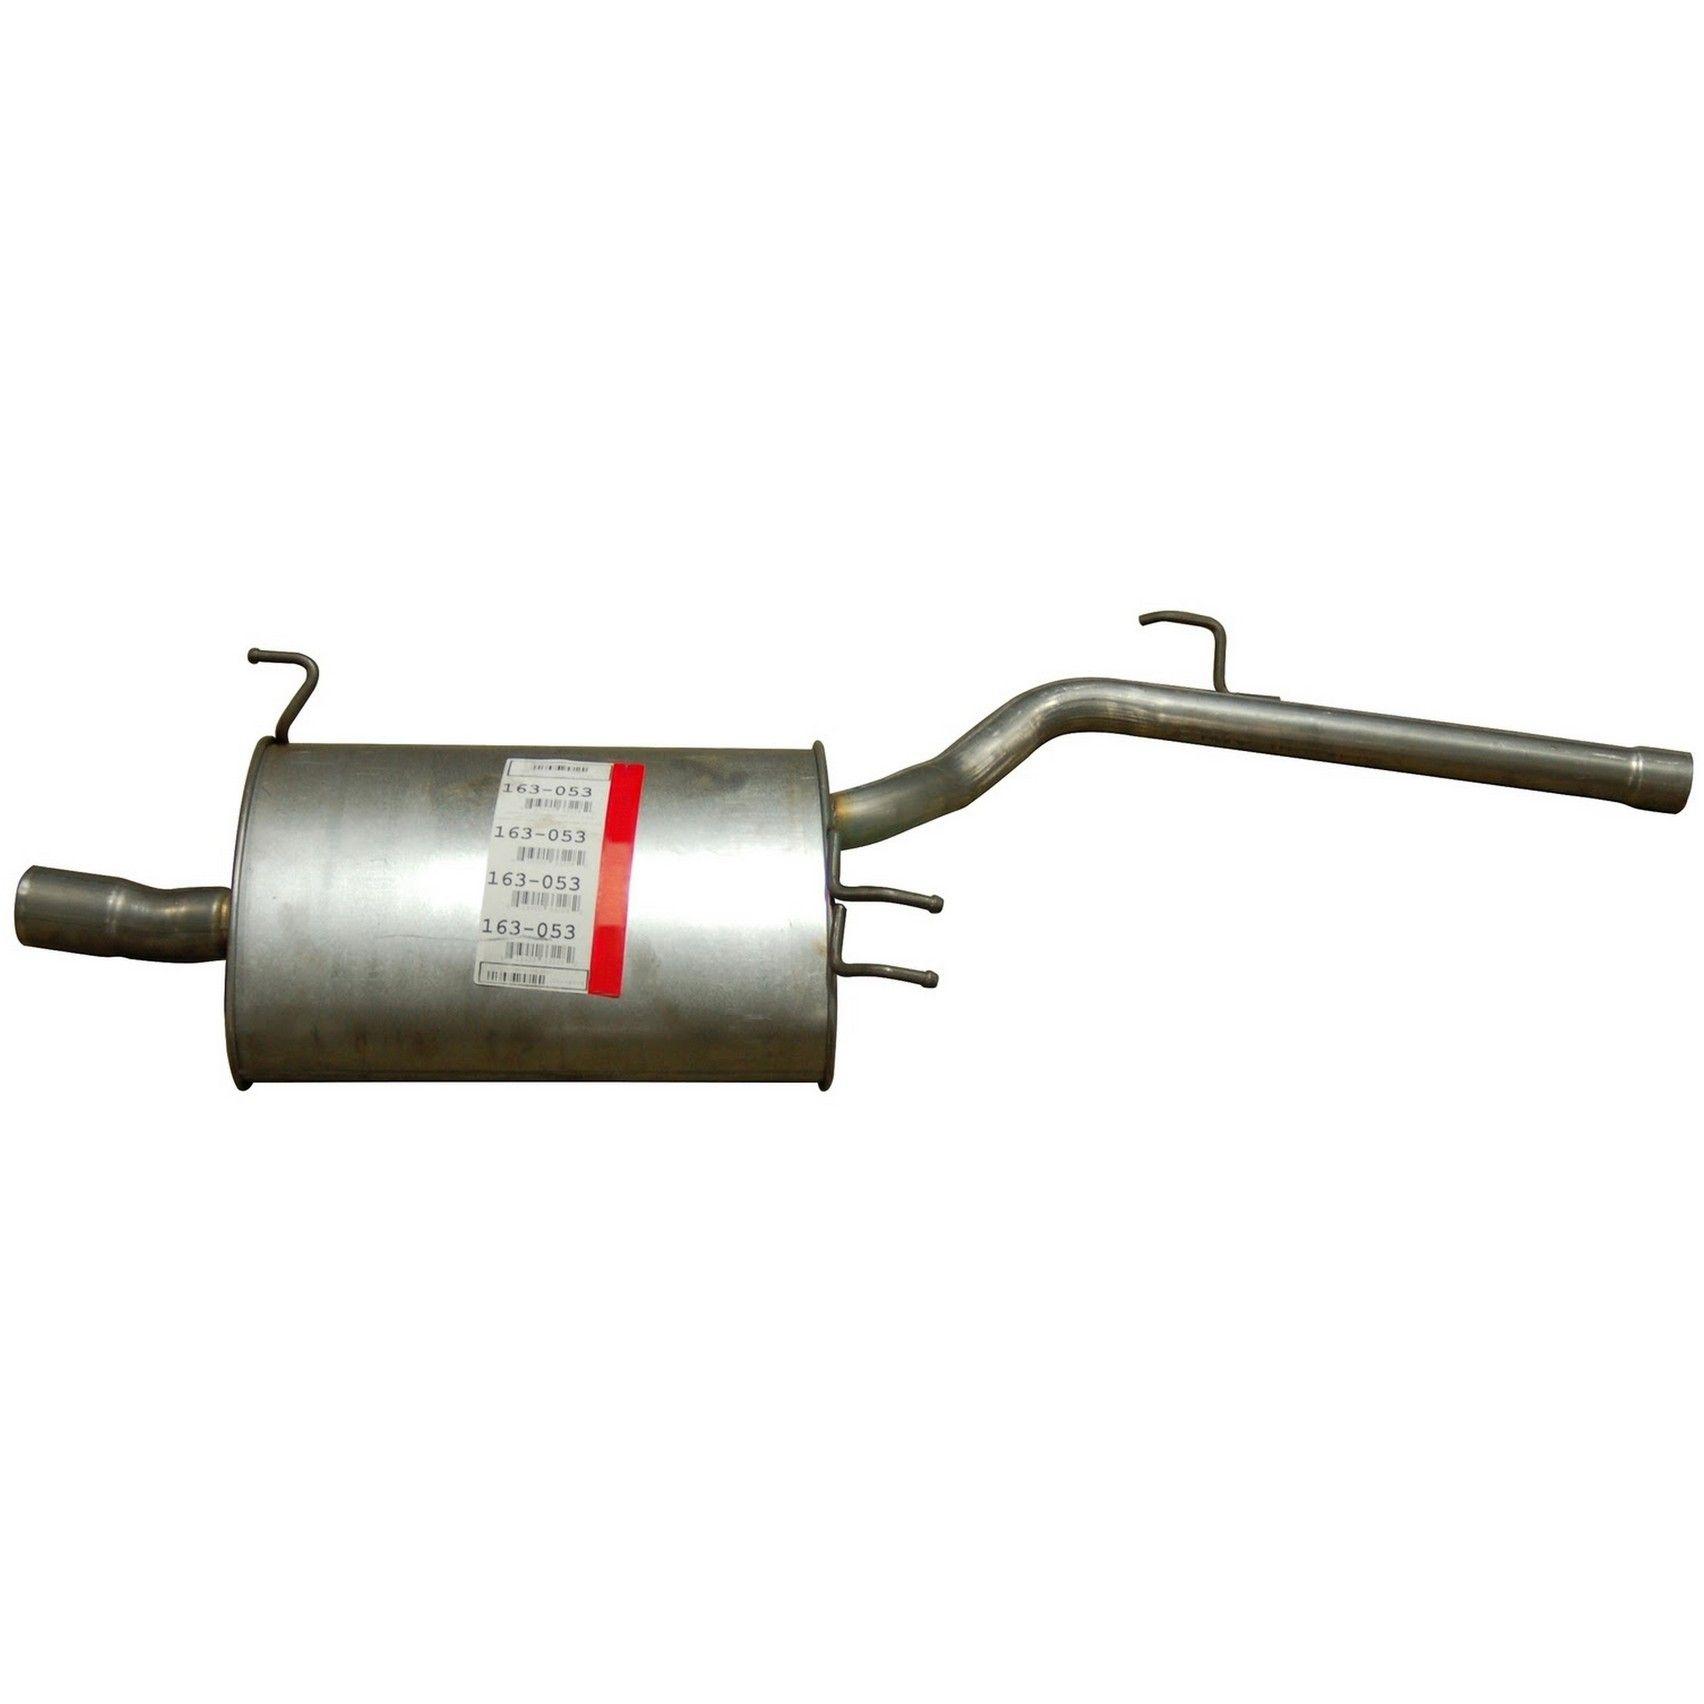 Bosal VFM-1746 Exhaust Silencer